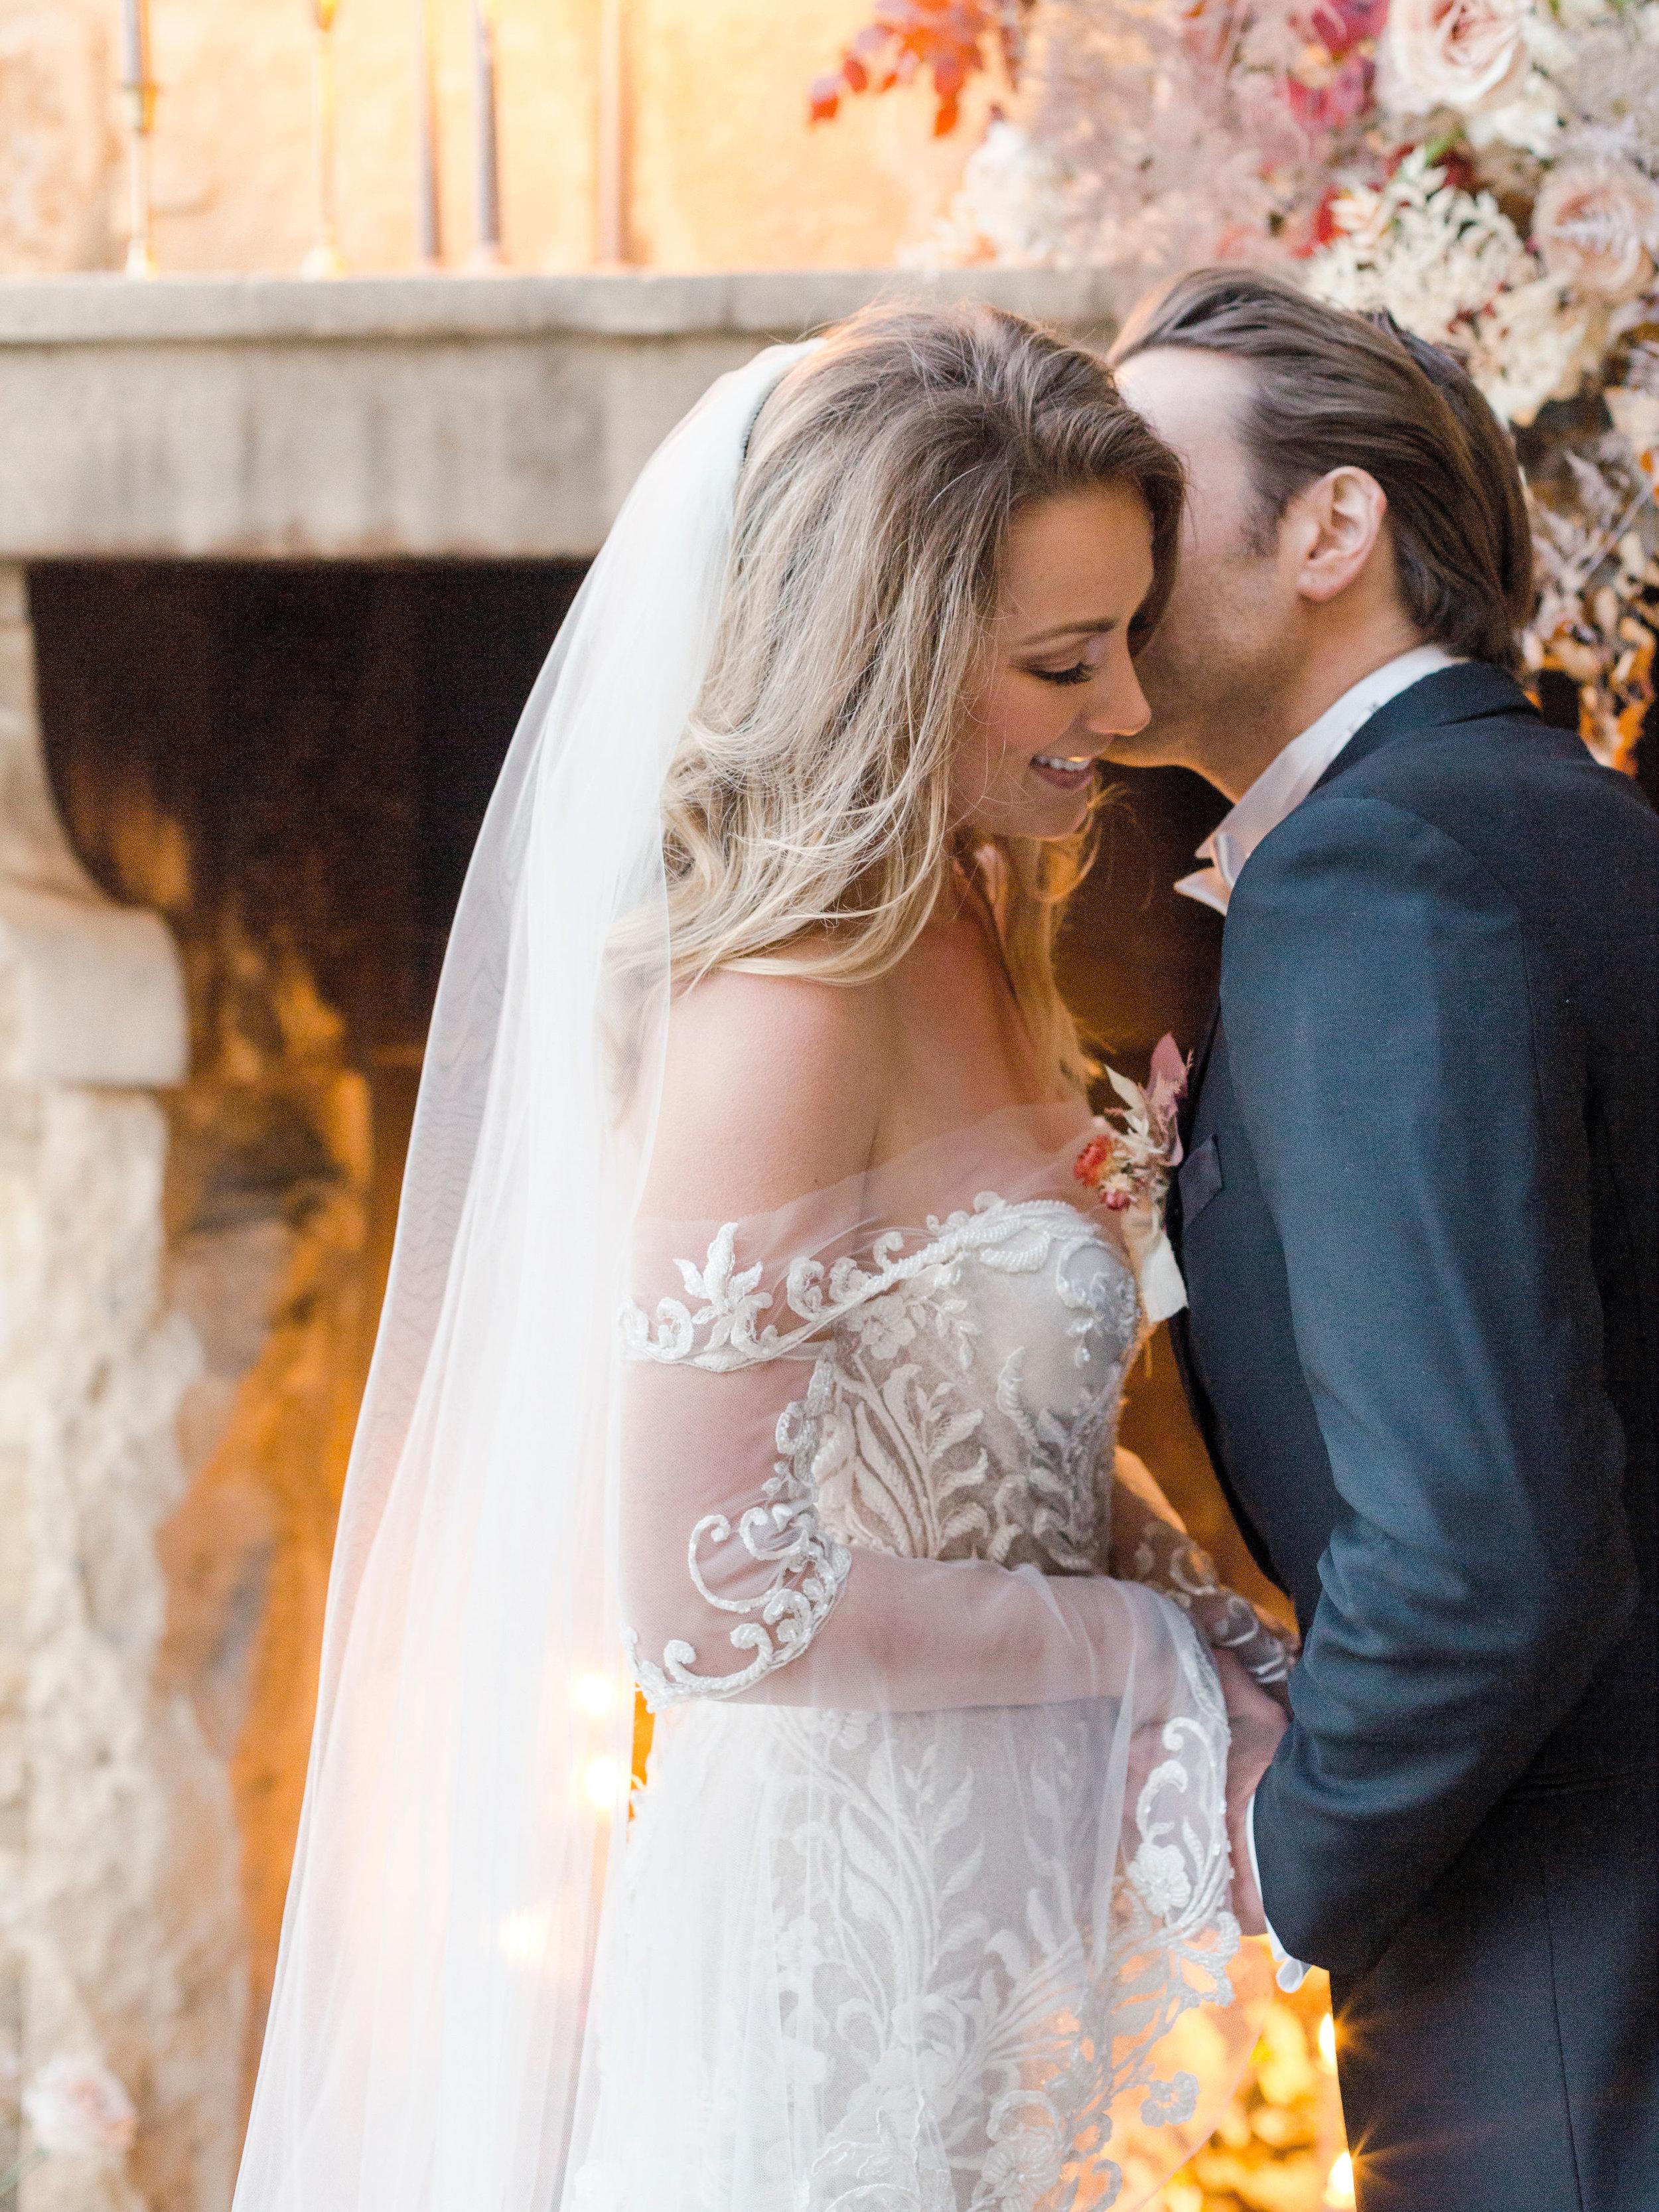 jessica-zimmerman-events-sunstone-ceremony-wedding-vows.jpg